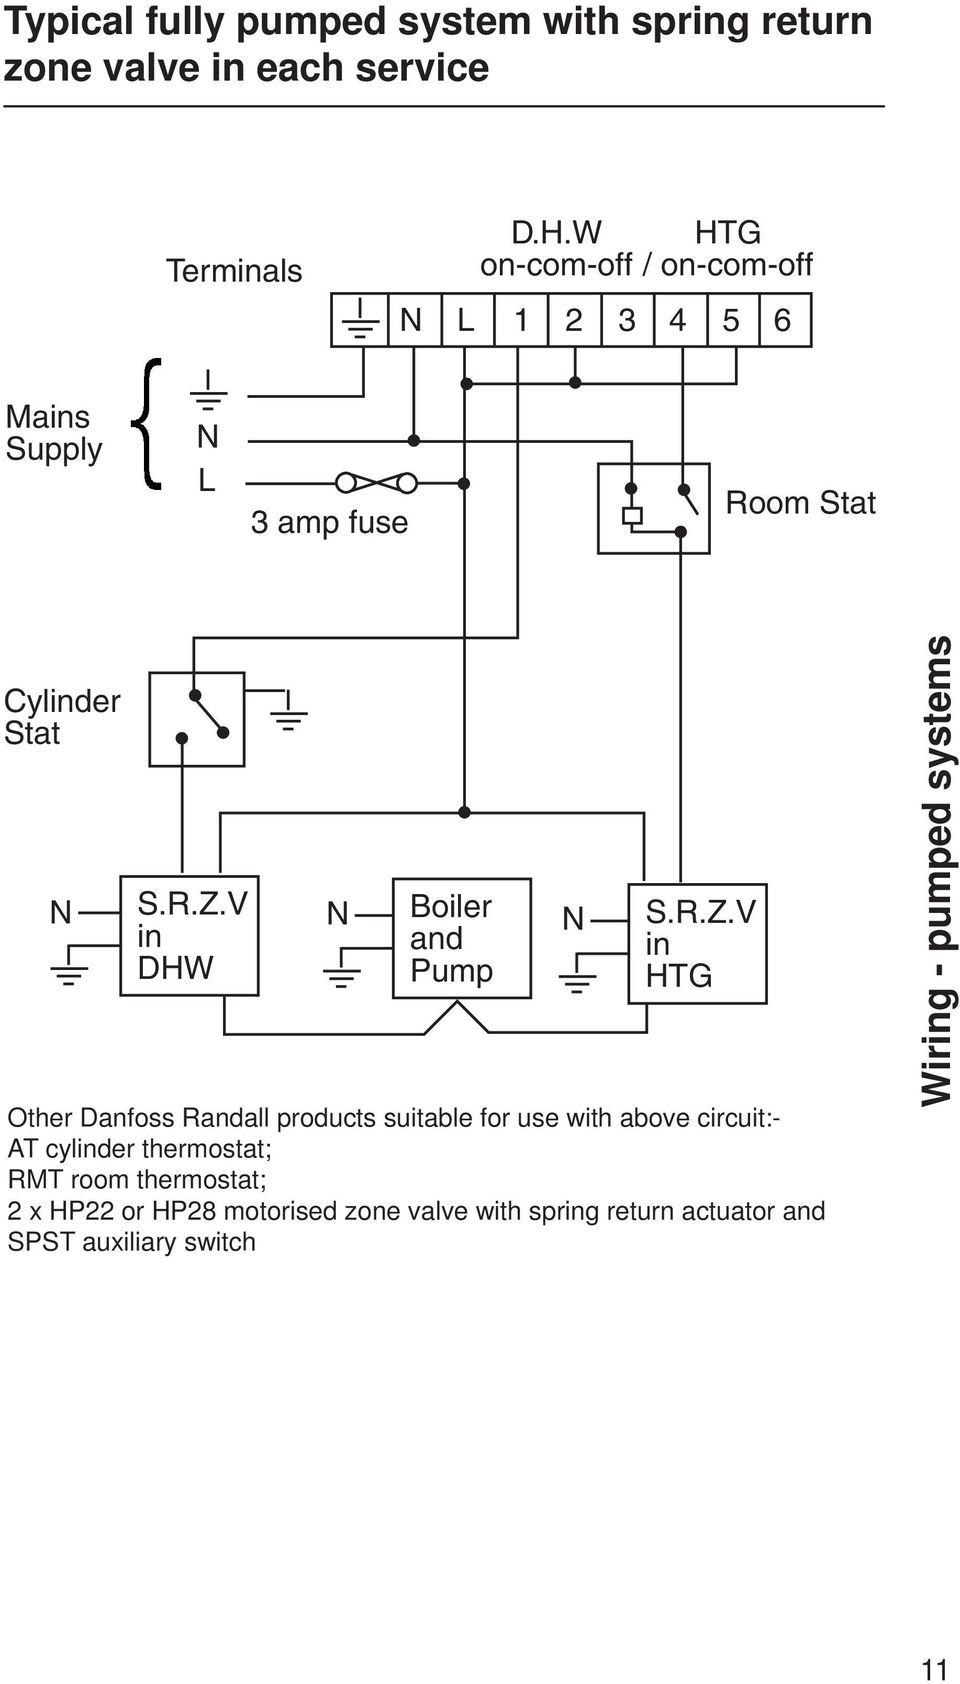 hight resolution of danfoss randall ltd dual cylinder thermostat wiring diagram set3m electro mechanical 24 programmer